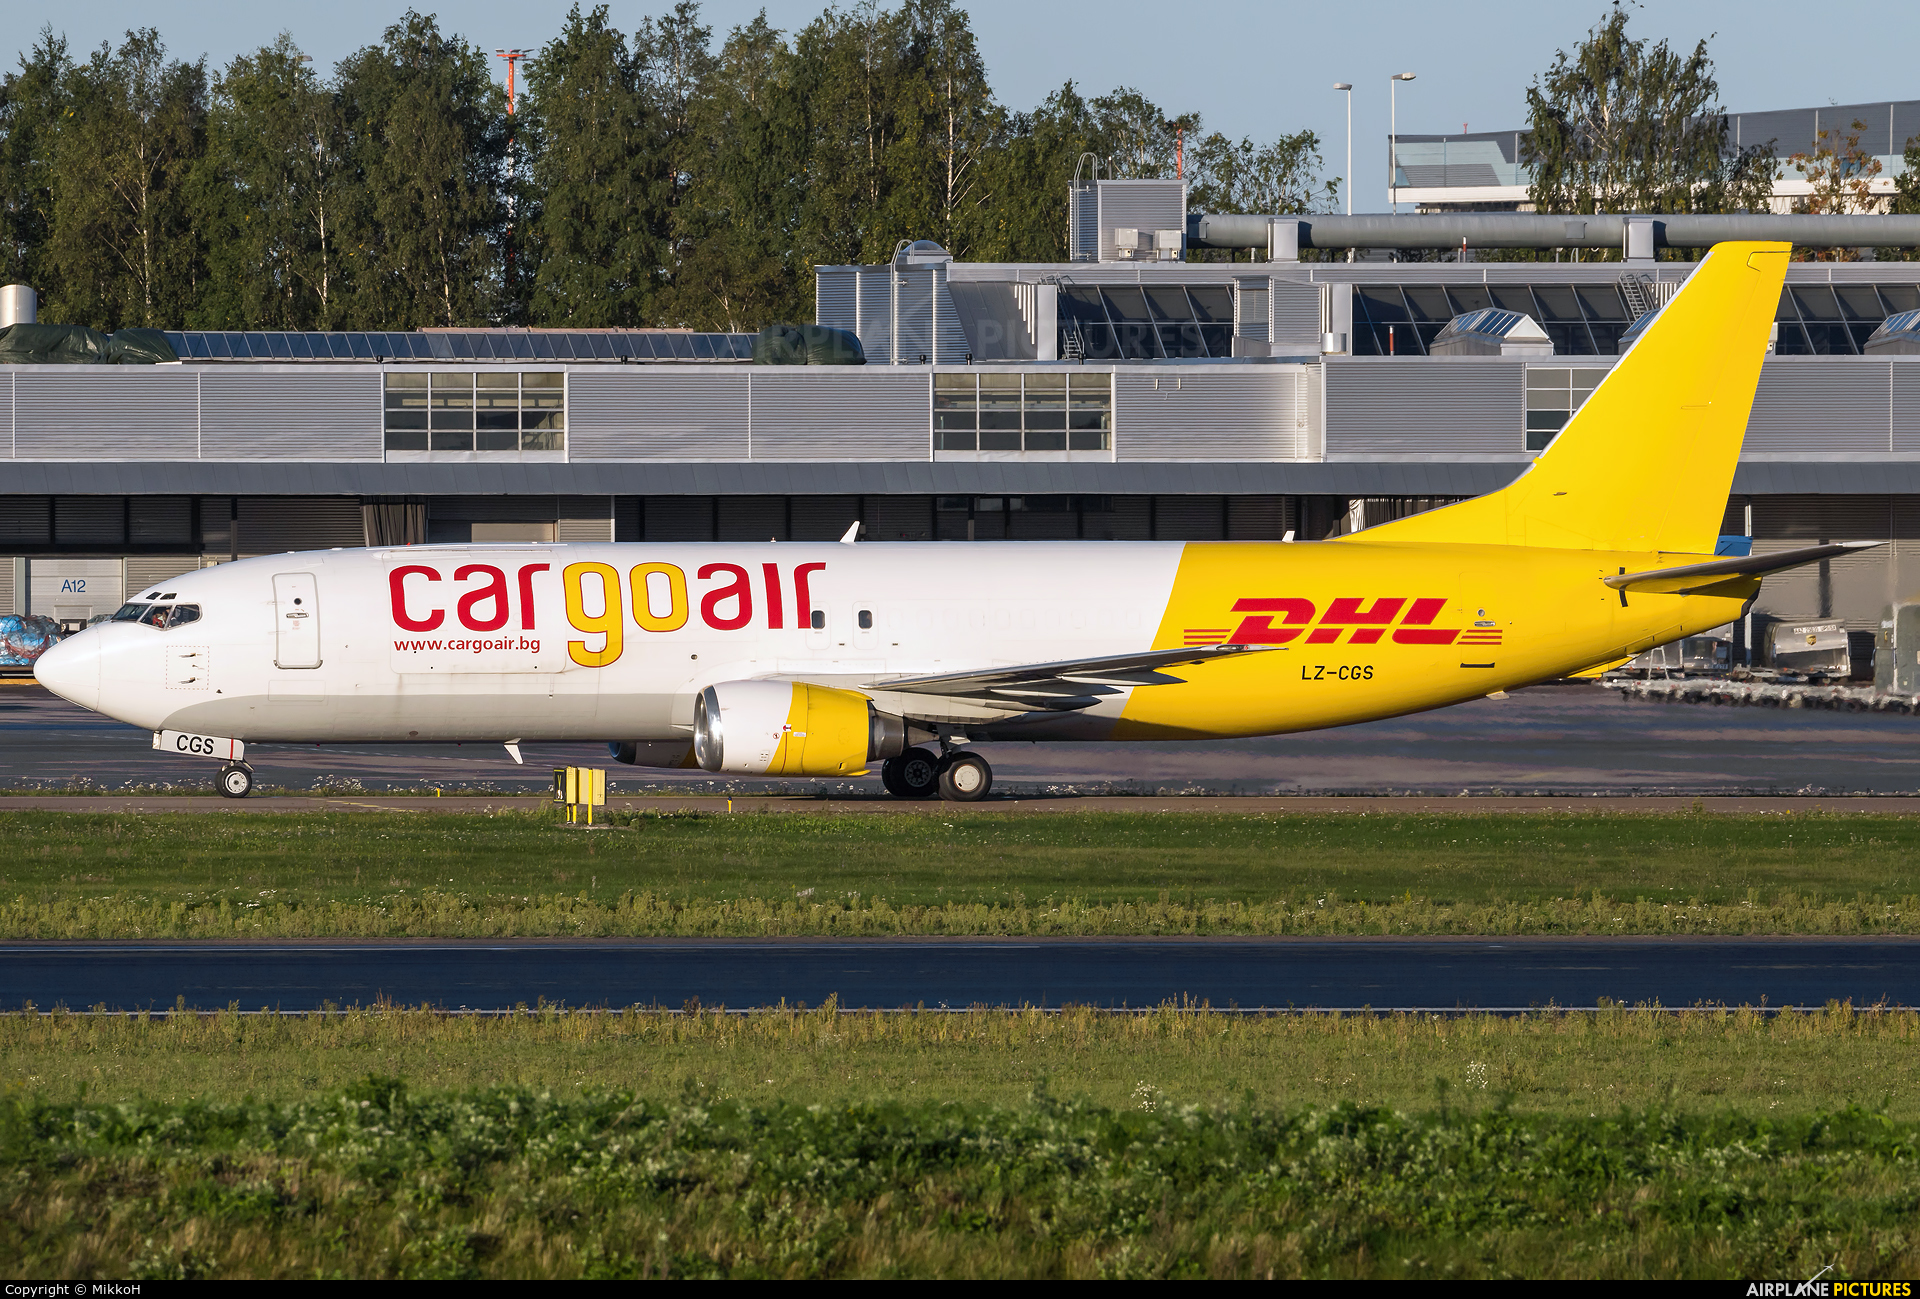 Cargo Air LZ-CGS aircraft at Helsinki - Vantaa